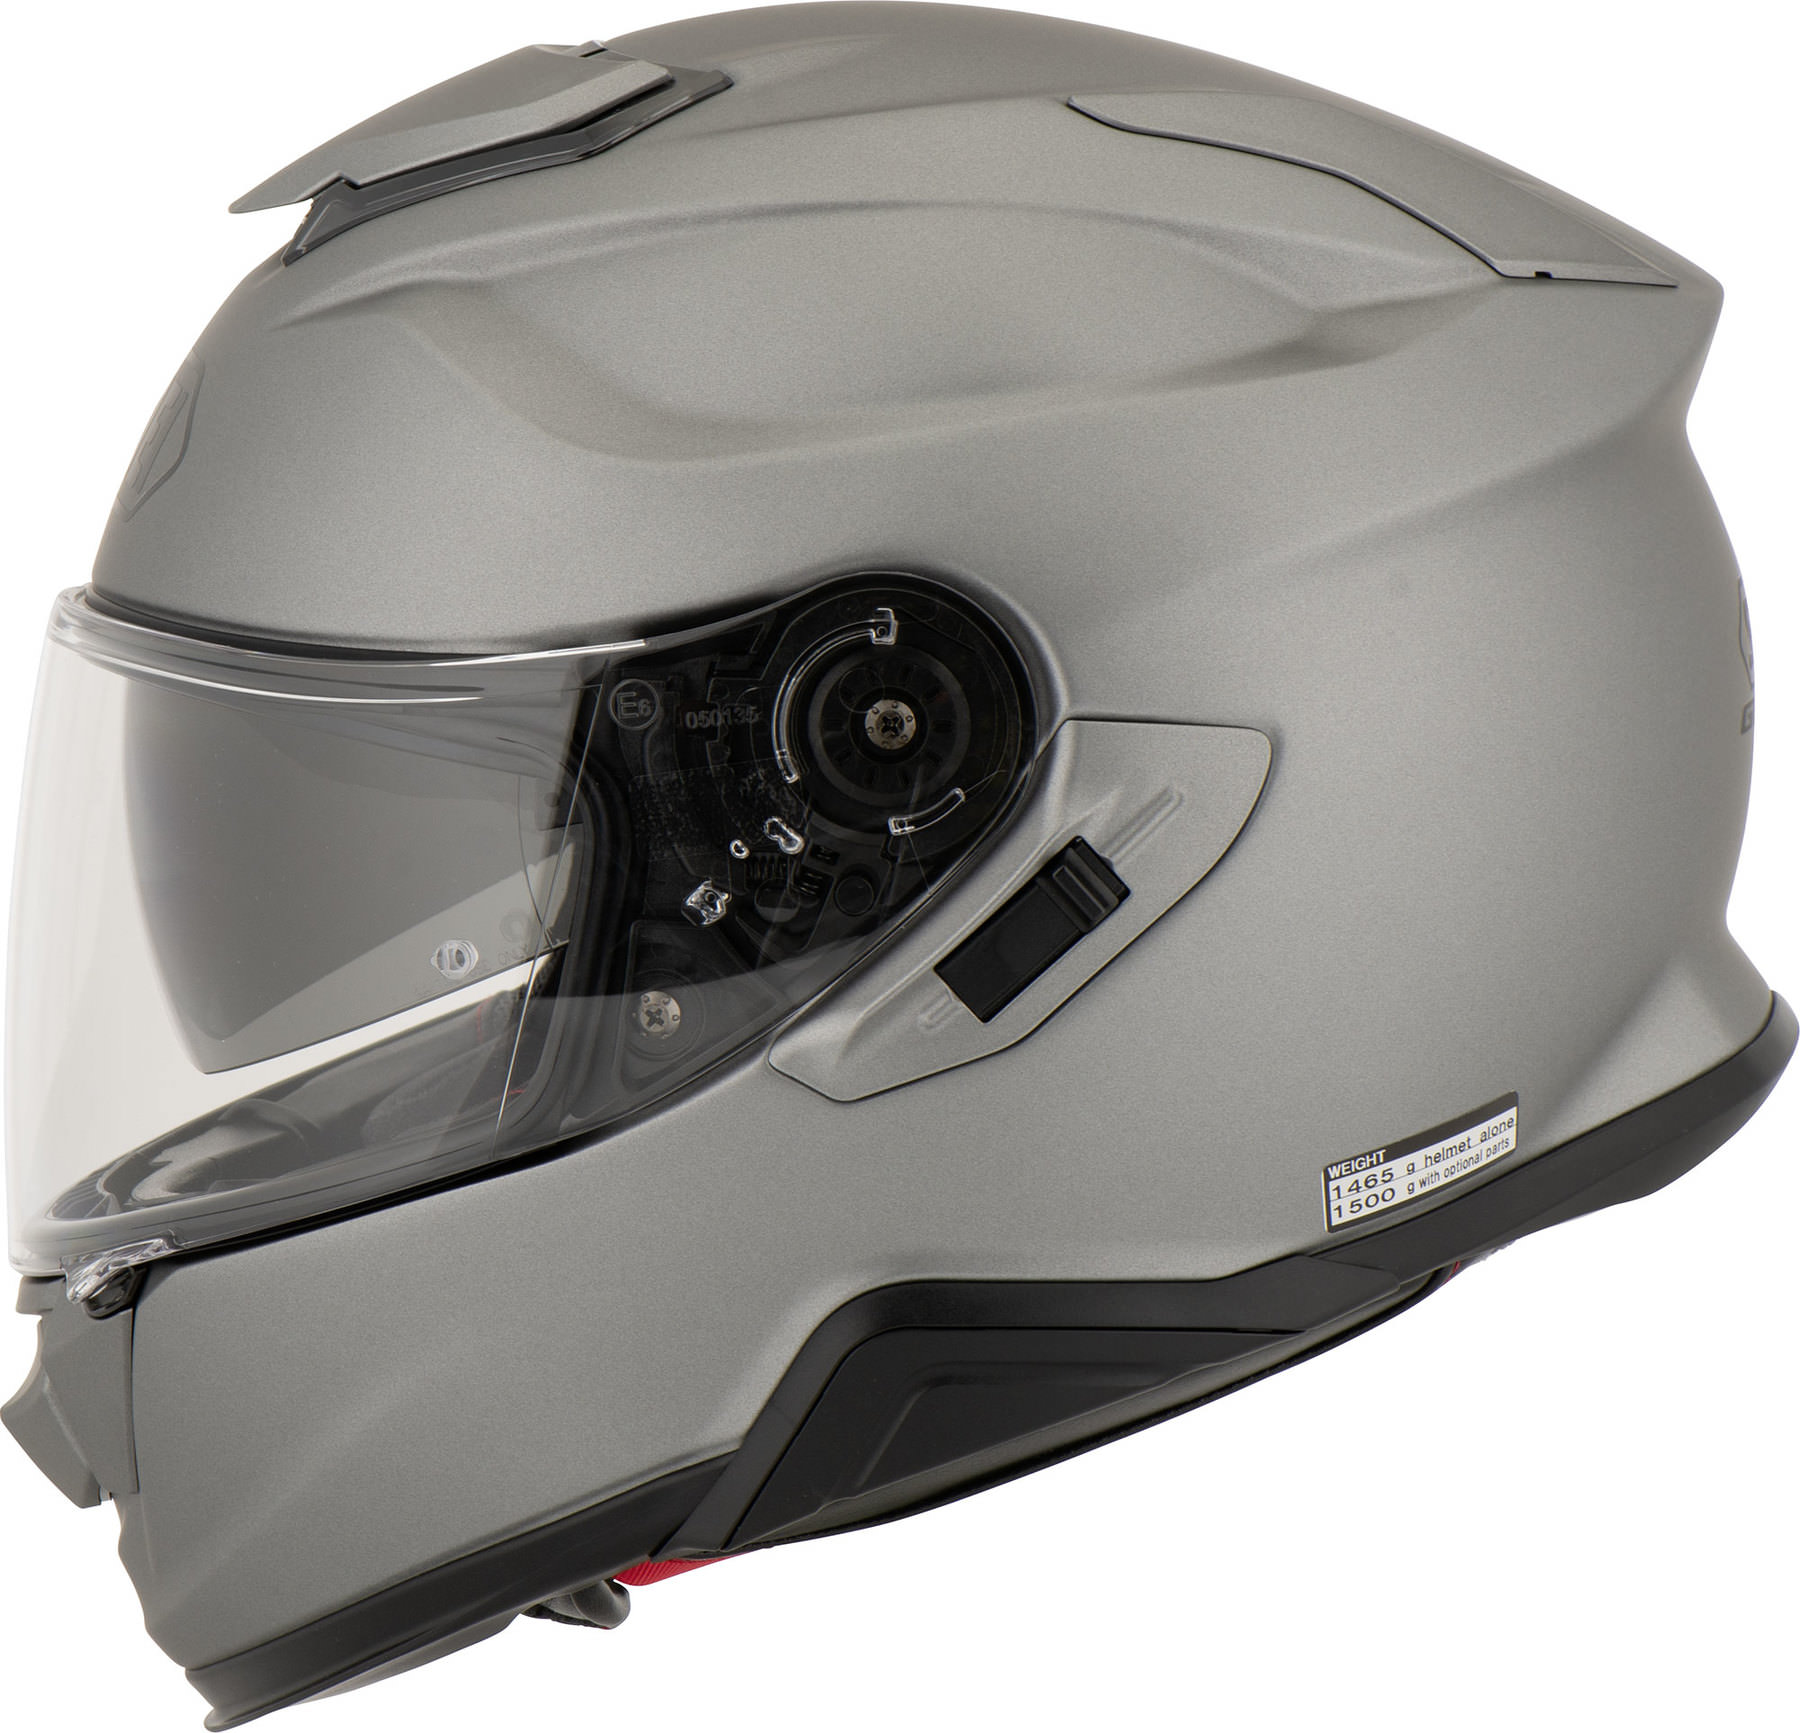 Capacete Shoei GT-Air II - Cinza Fosco - C/ Viseira Solar  - Planet Bike Shop Moto Acessórios